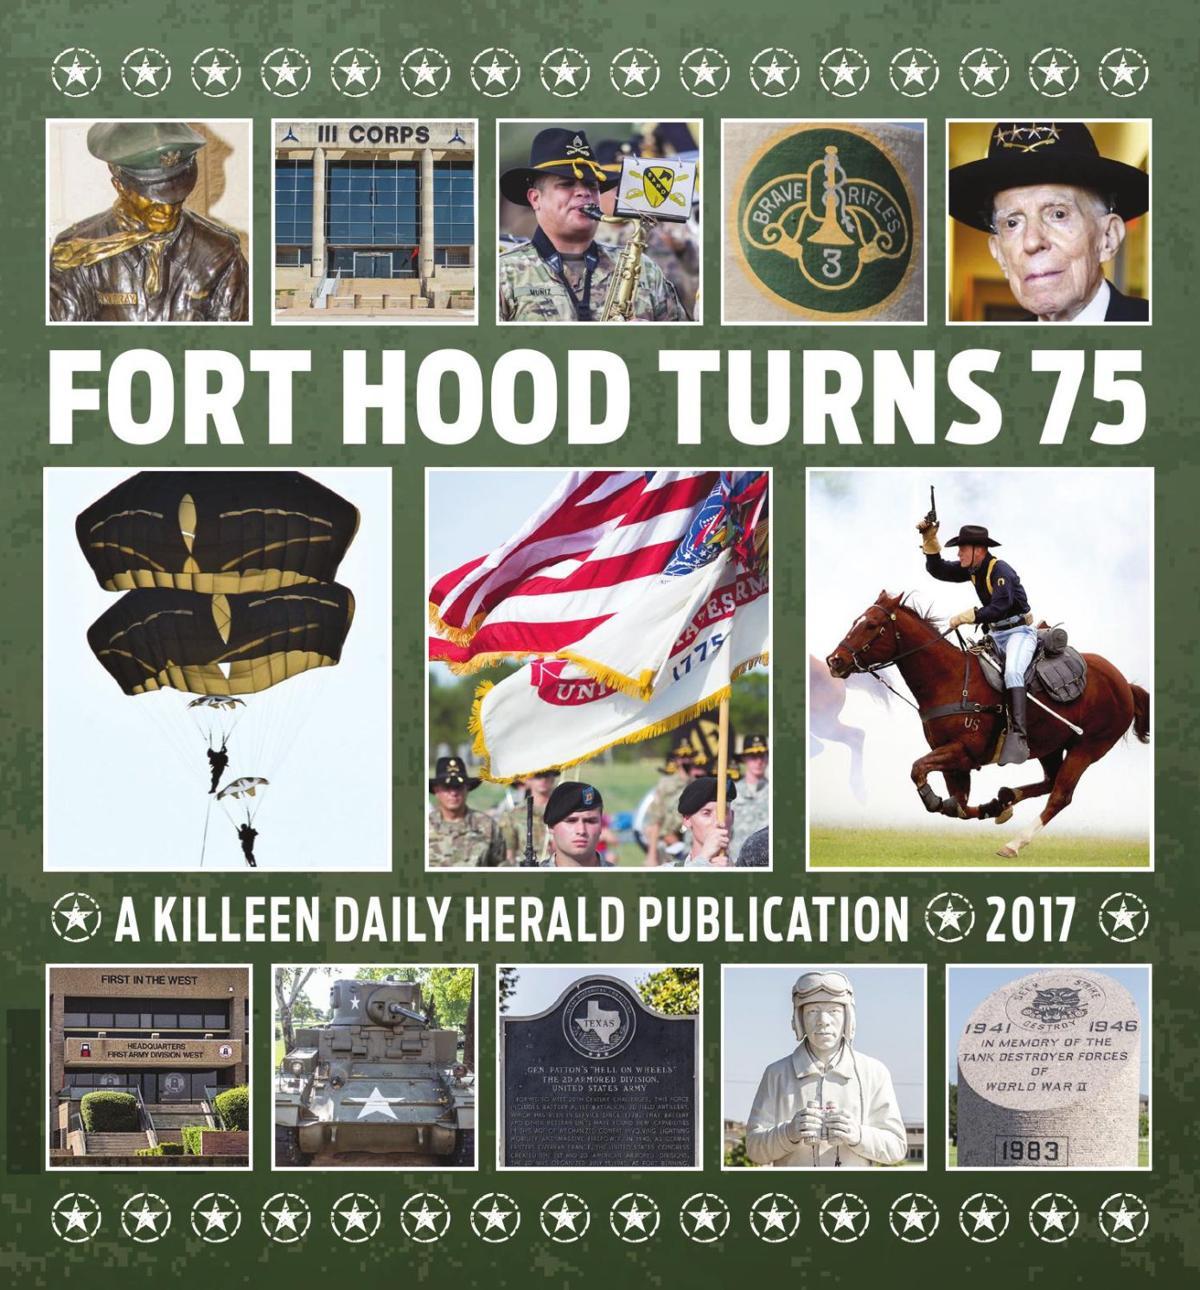 Fort Hood 75th Birthday